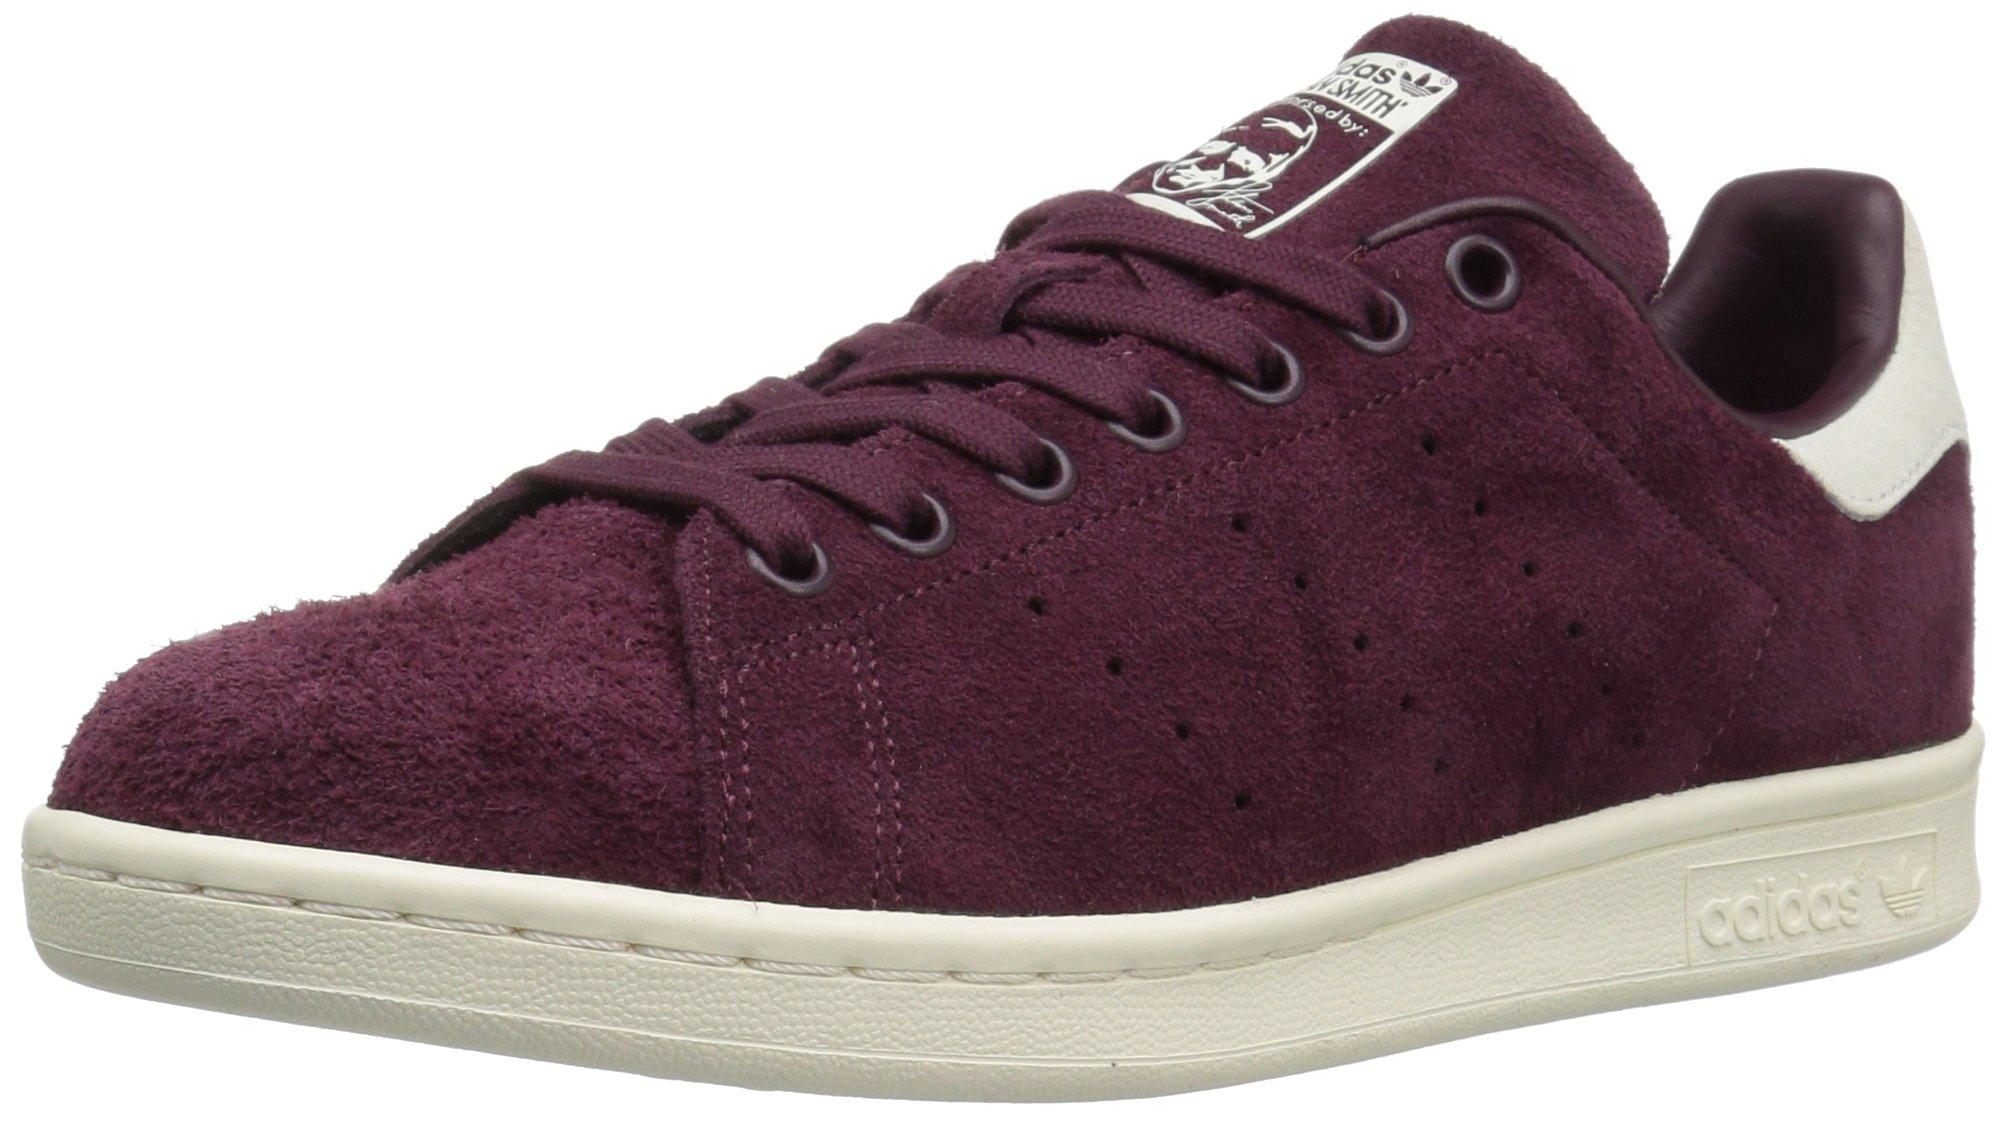 5d37249da506 Galleon - Adidas Originals Men s Stan Smith Fashion Running Shoe Light  Maroon Legacy